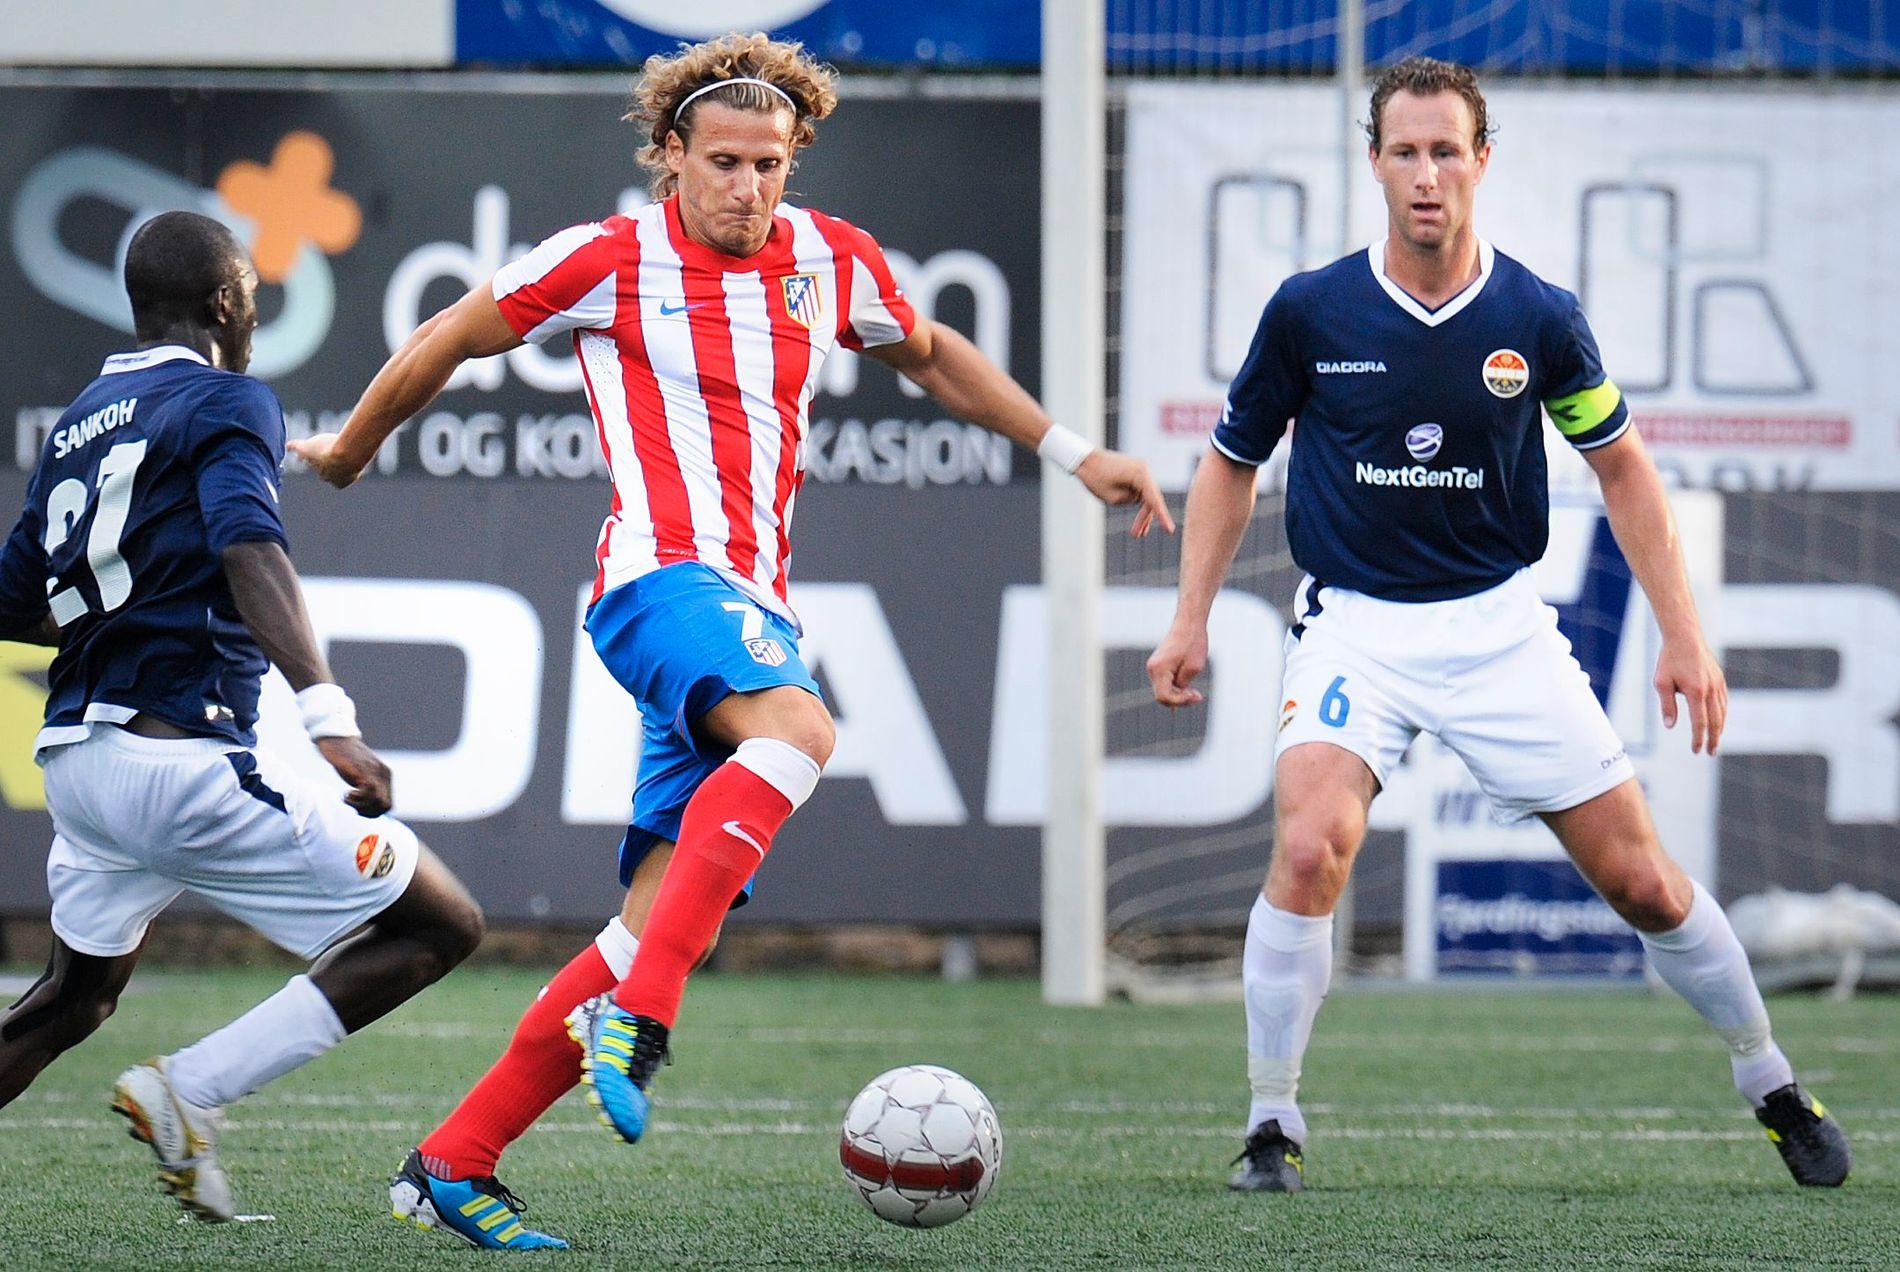 I DRAMMEN: Diego Forlán var med å slå Strømsgodset 2-0 i Europa League-kvalifiseringen i 2011. Her i duell mot Alfred Sankoh og Alexander Aas.